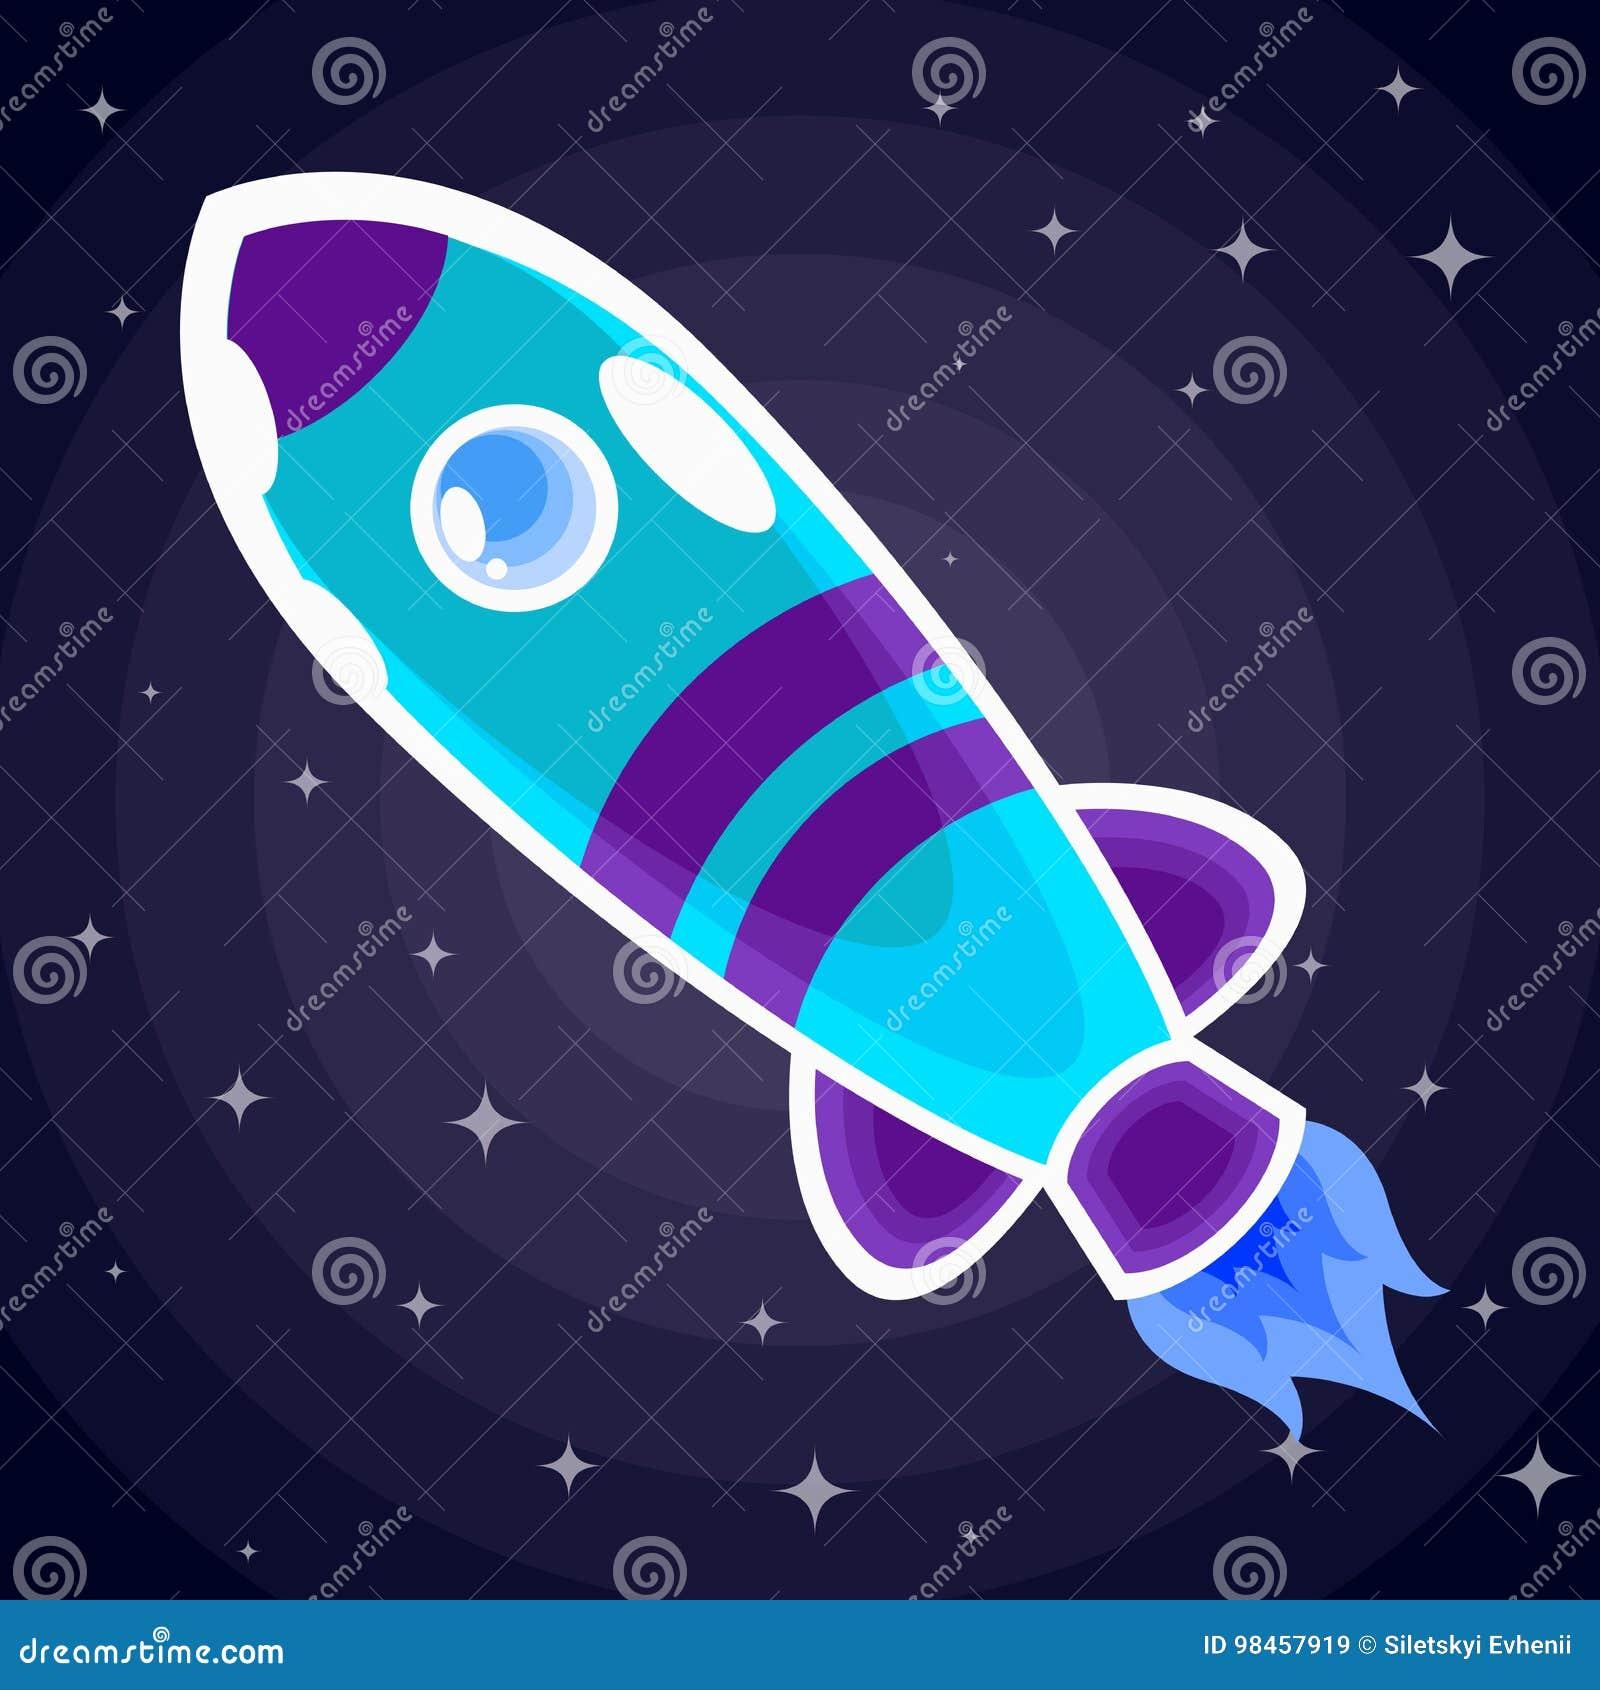 Blue With Purple Stripes Space Rocket With A Porthole Flies